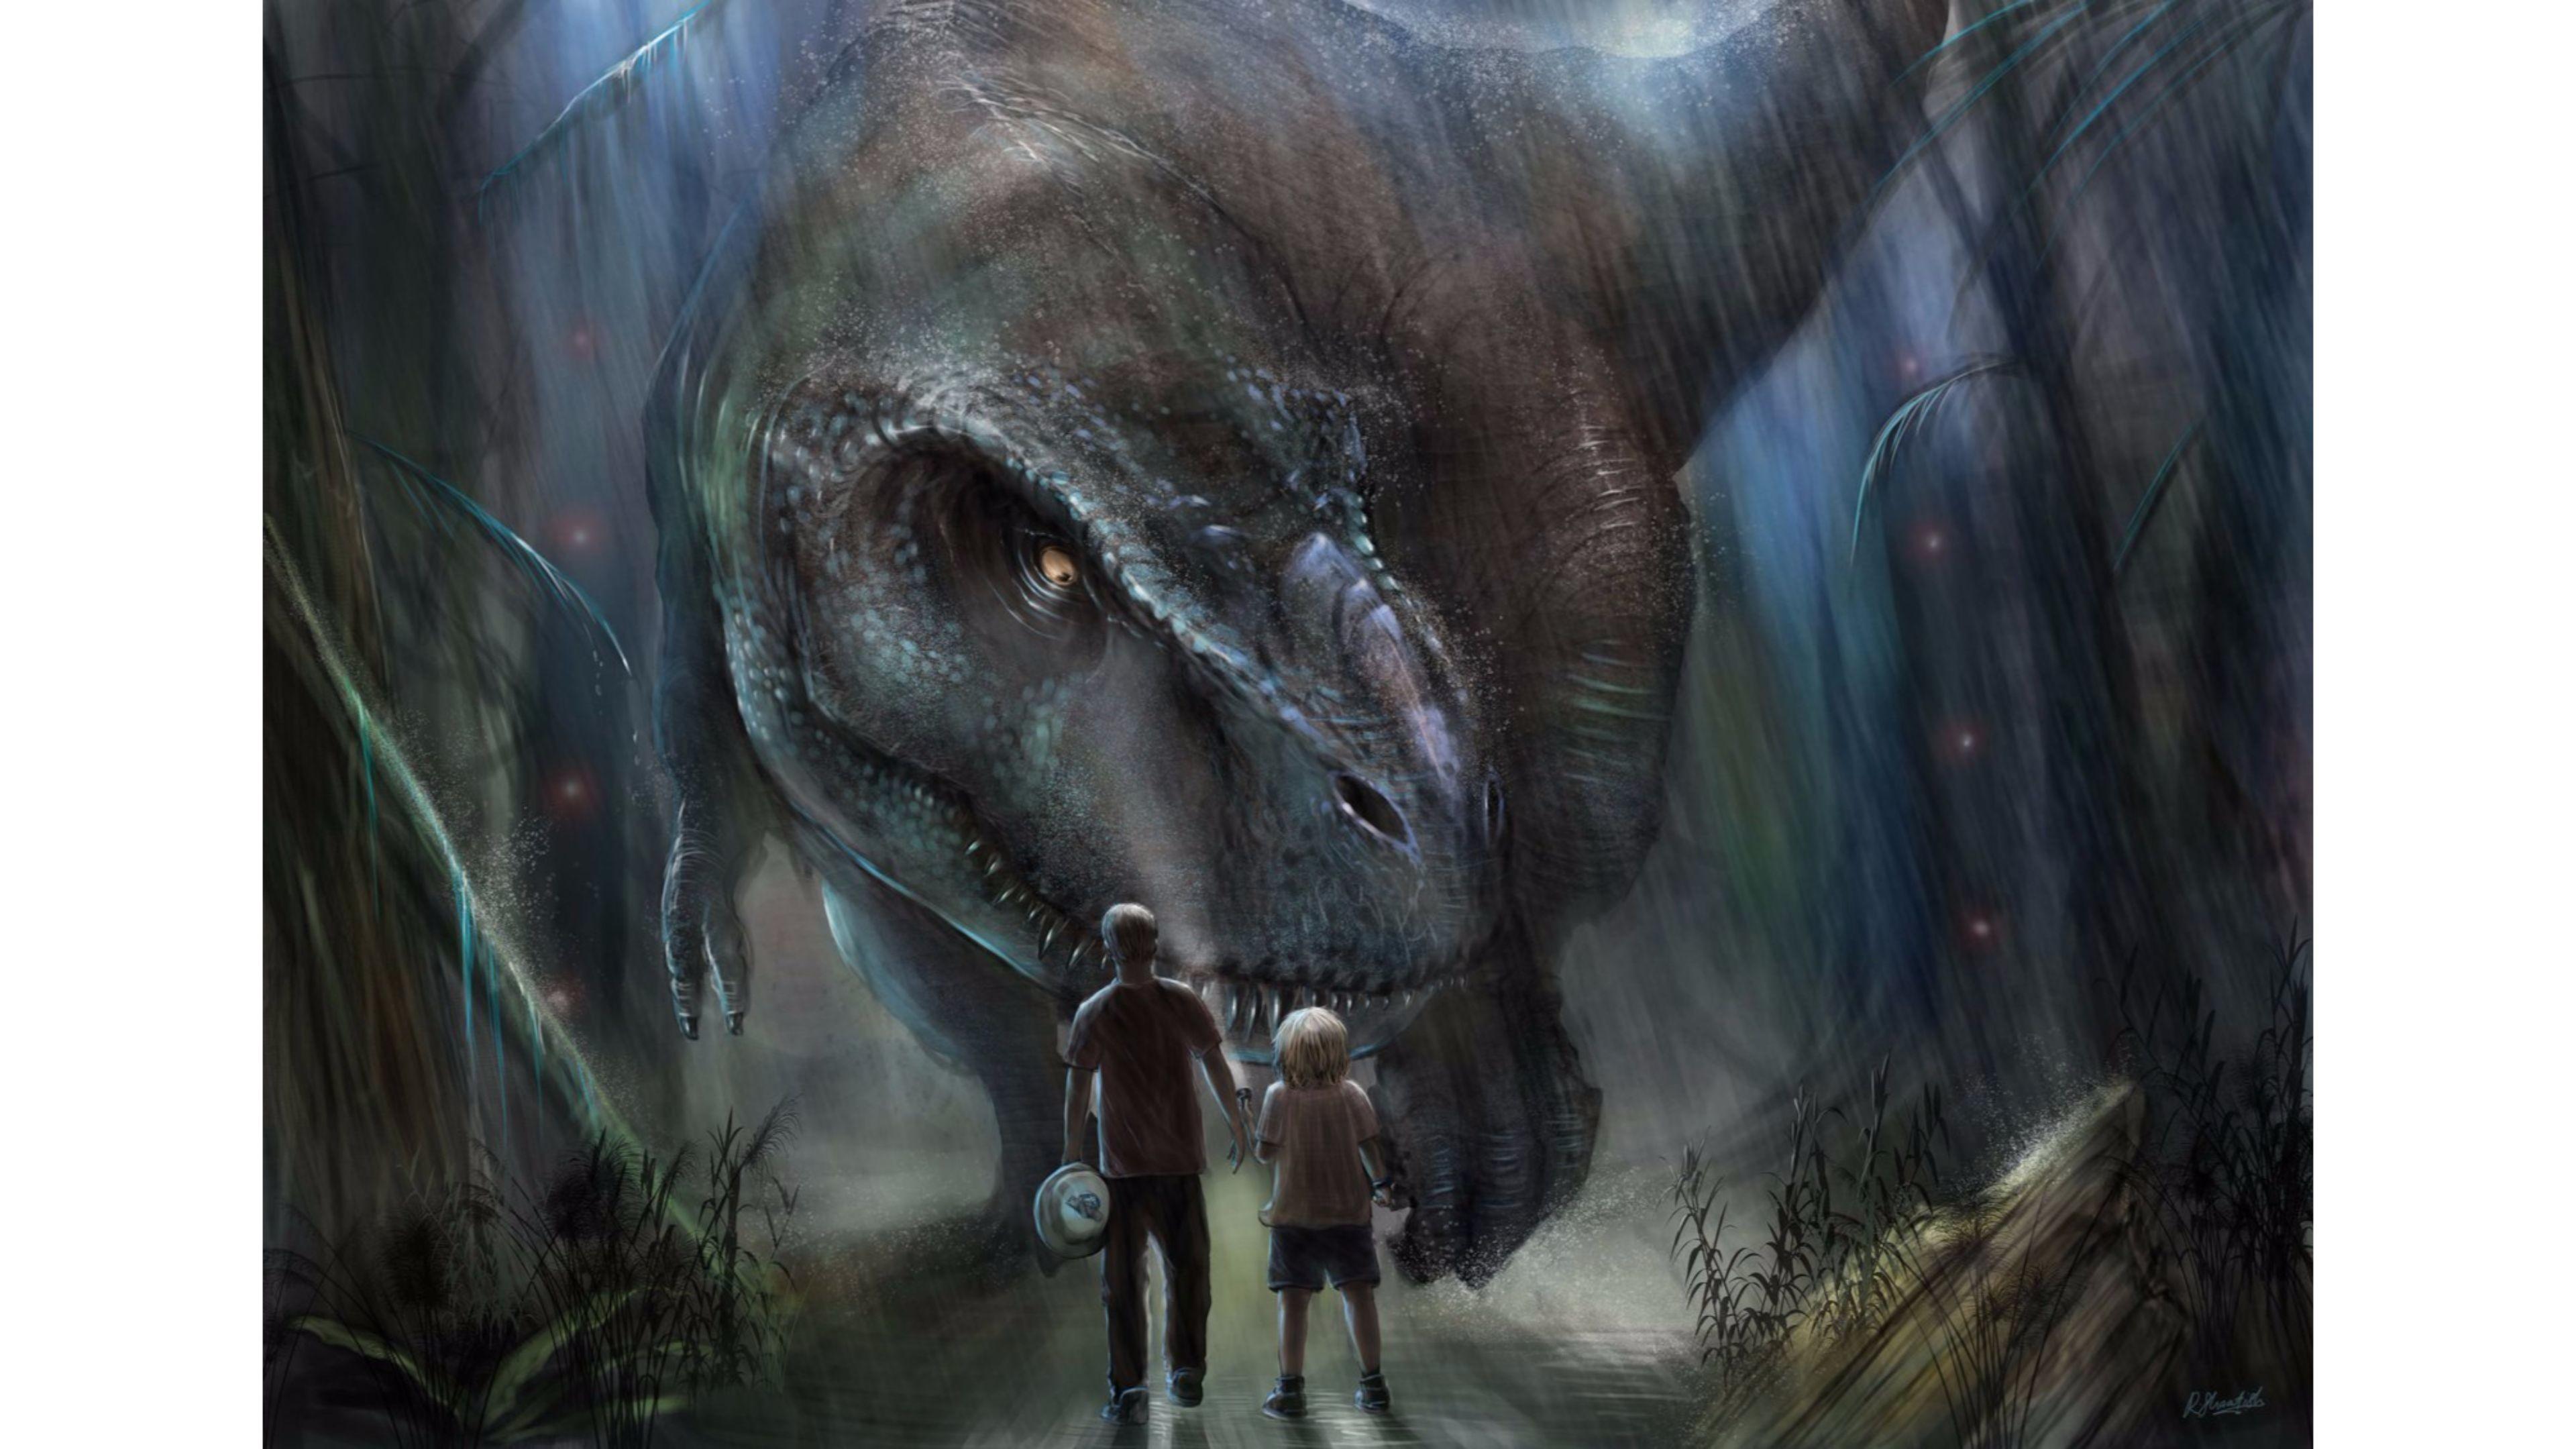 Beautiful 3d Wallpaper Iphone 6 Jurassic World Wallpapers 76 Images